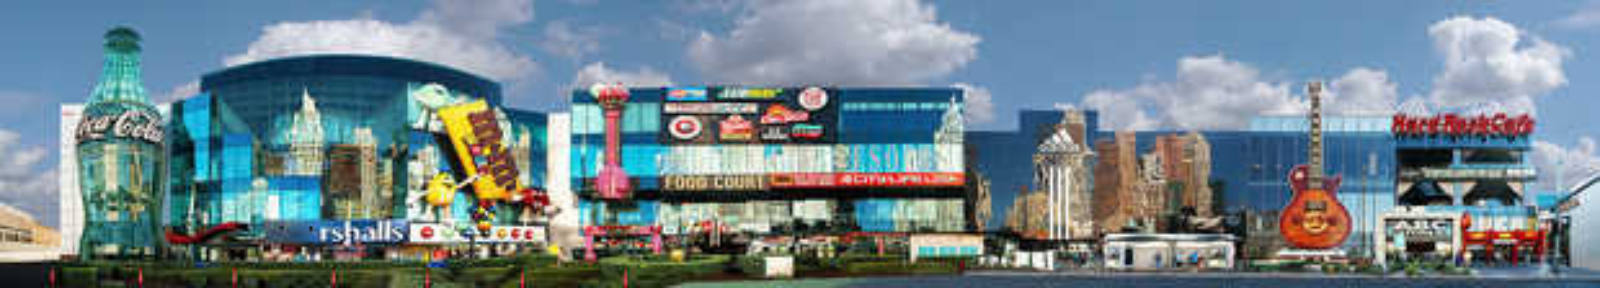 3745 South Las Vegas Boulevard, Las Vegas - Larry Yust